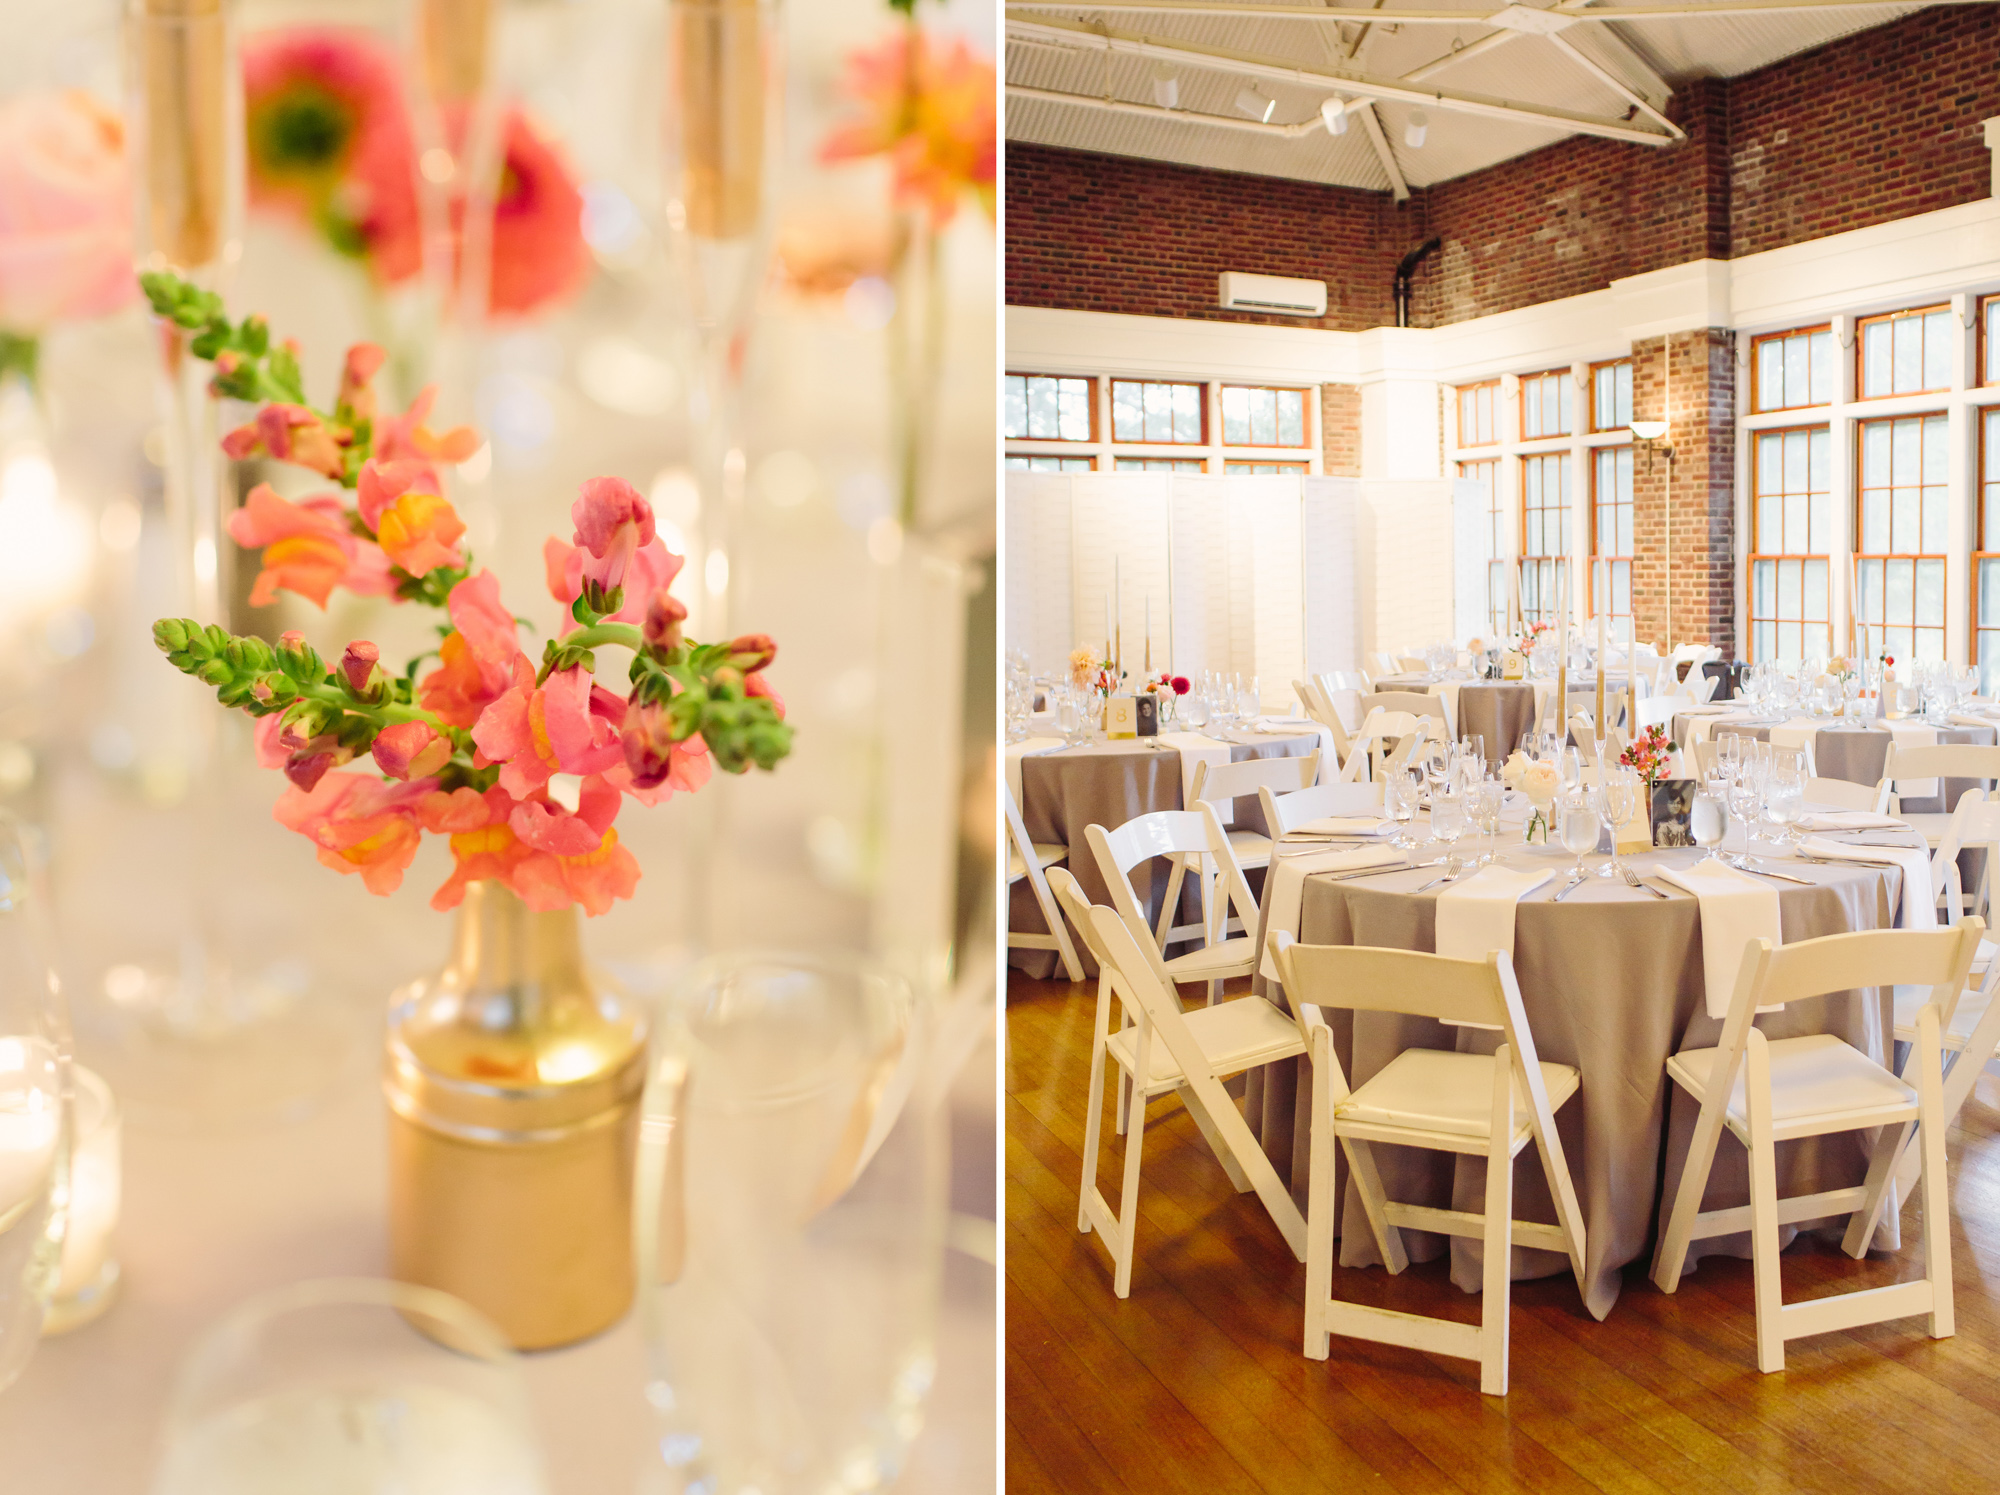 34_Kate_Sam_Picnic_House_Wedding_Brooklyn_NY_Tanya_Salazar_Photography.jpg